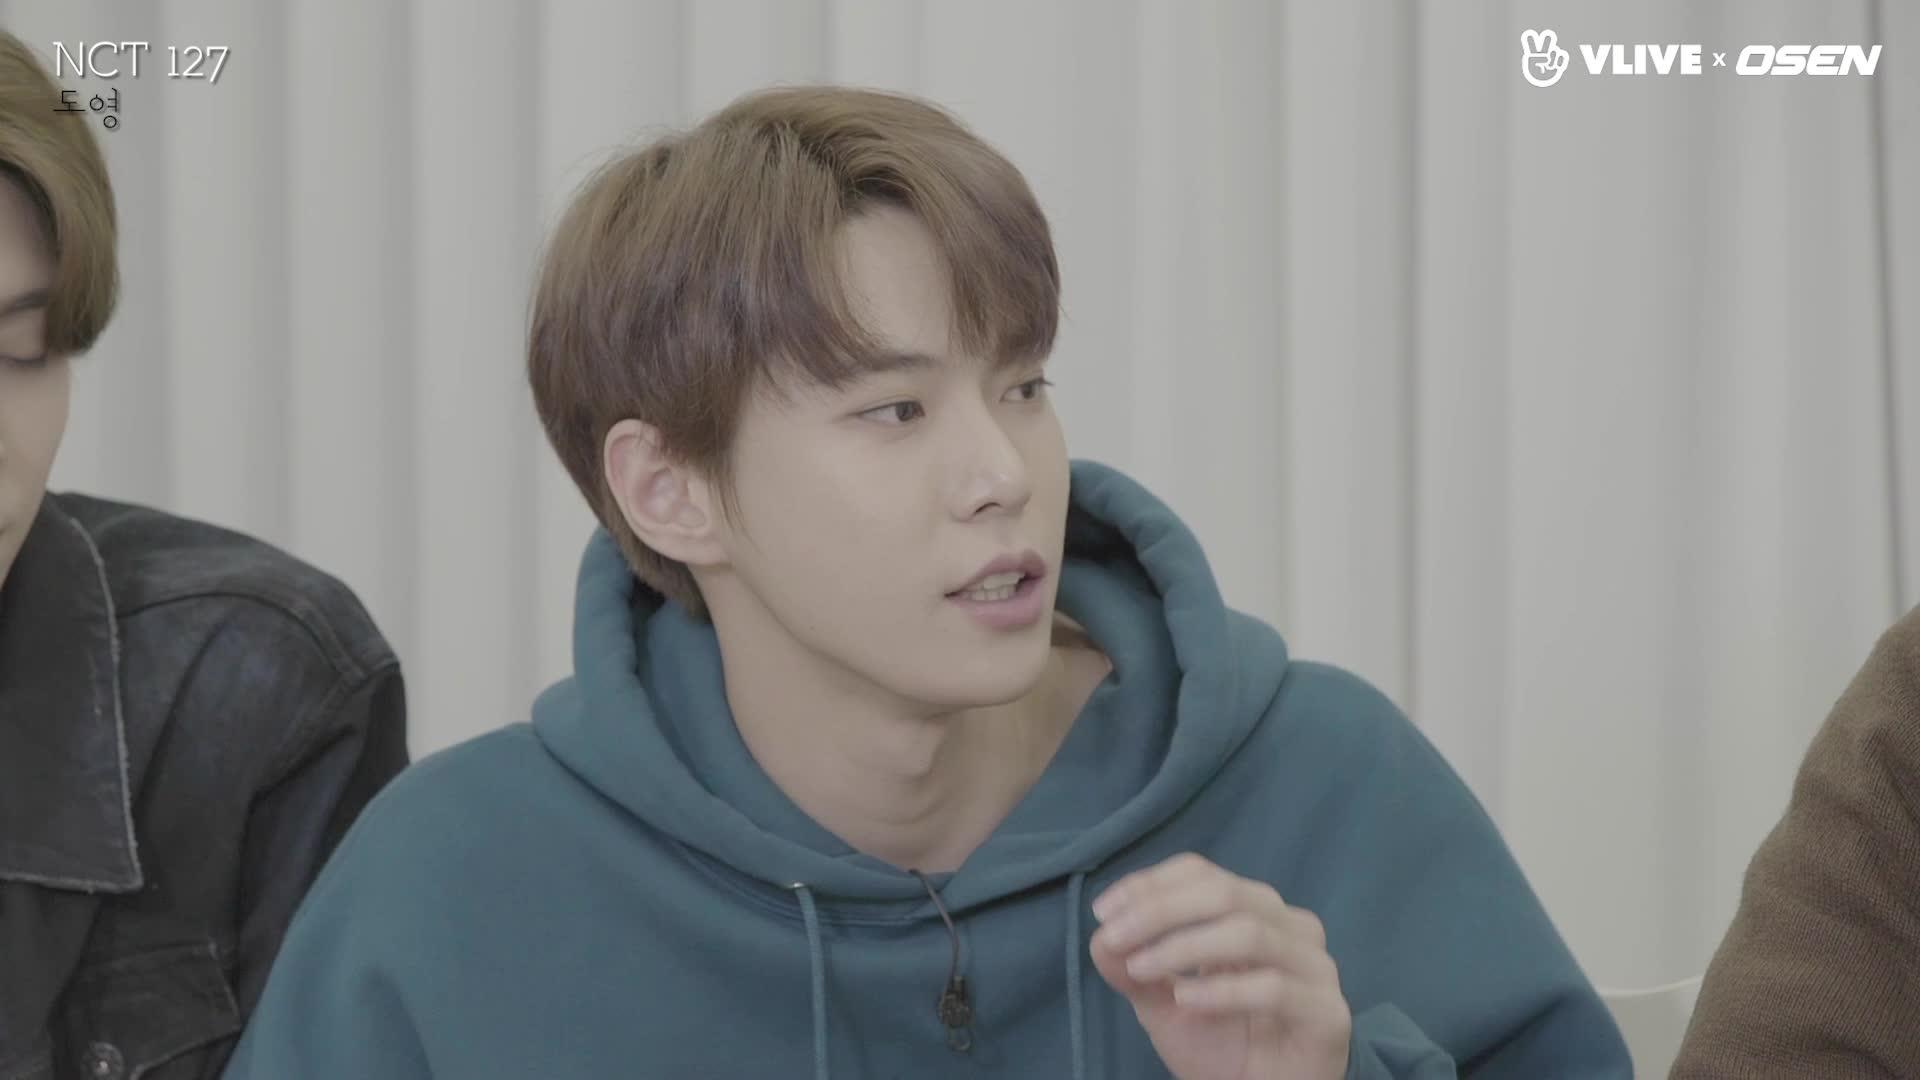 NCT 127 'Star Road' 하이라이트 02.도영